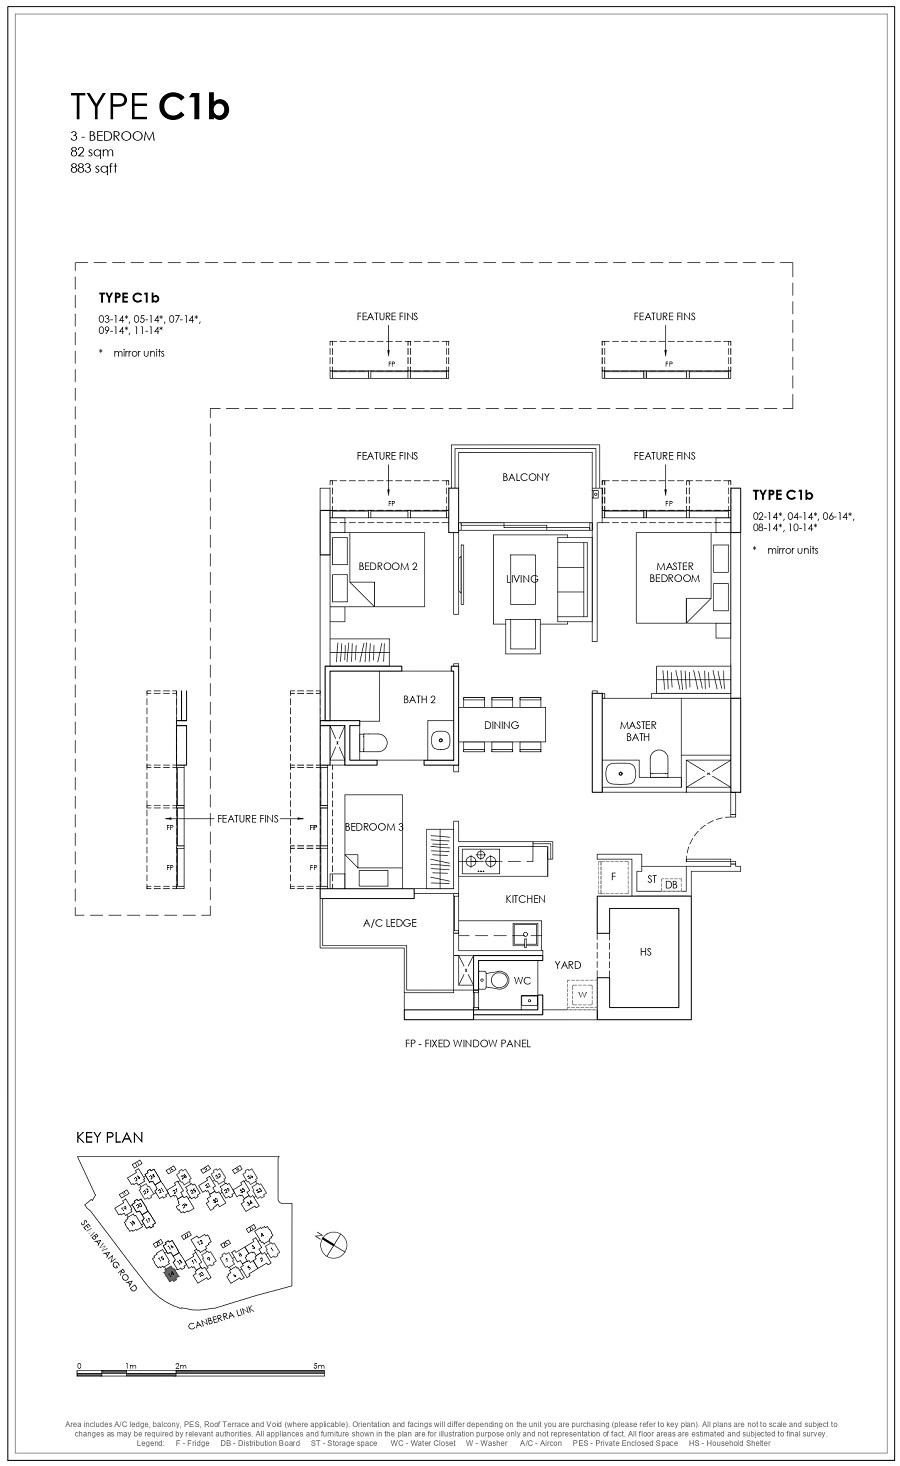 Provence Residence EC 3BR Type C1b 82_883